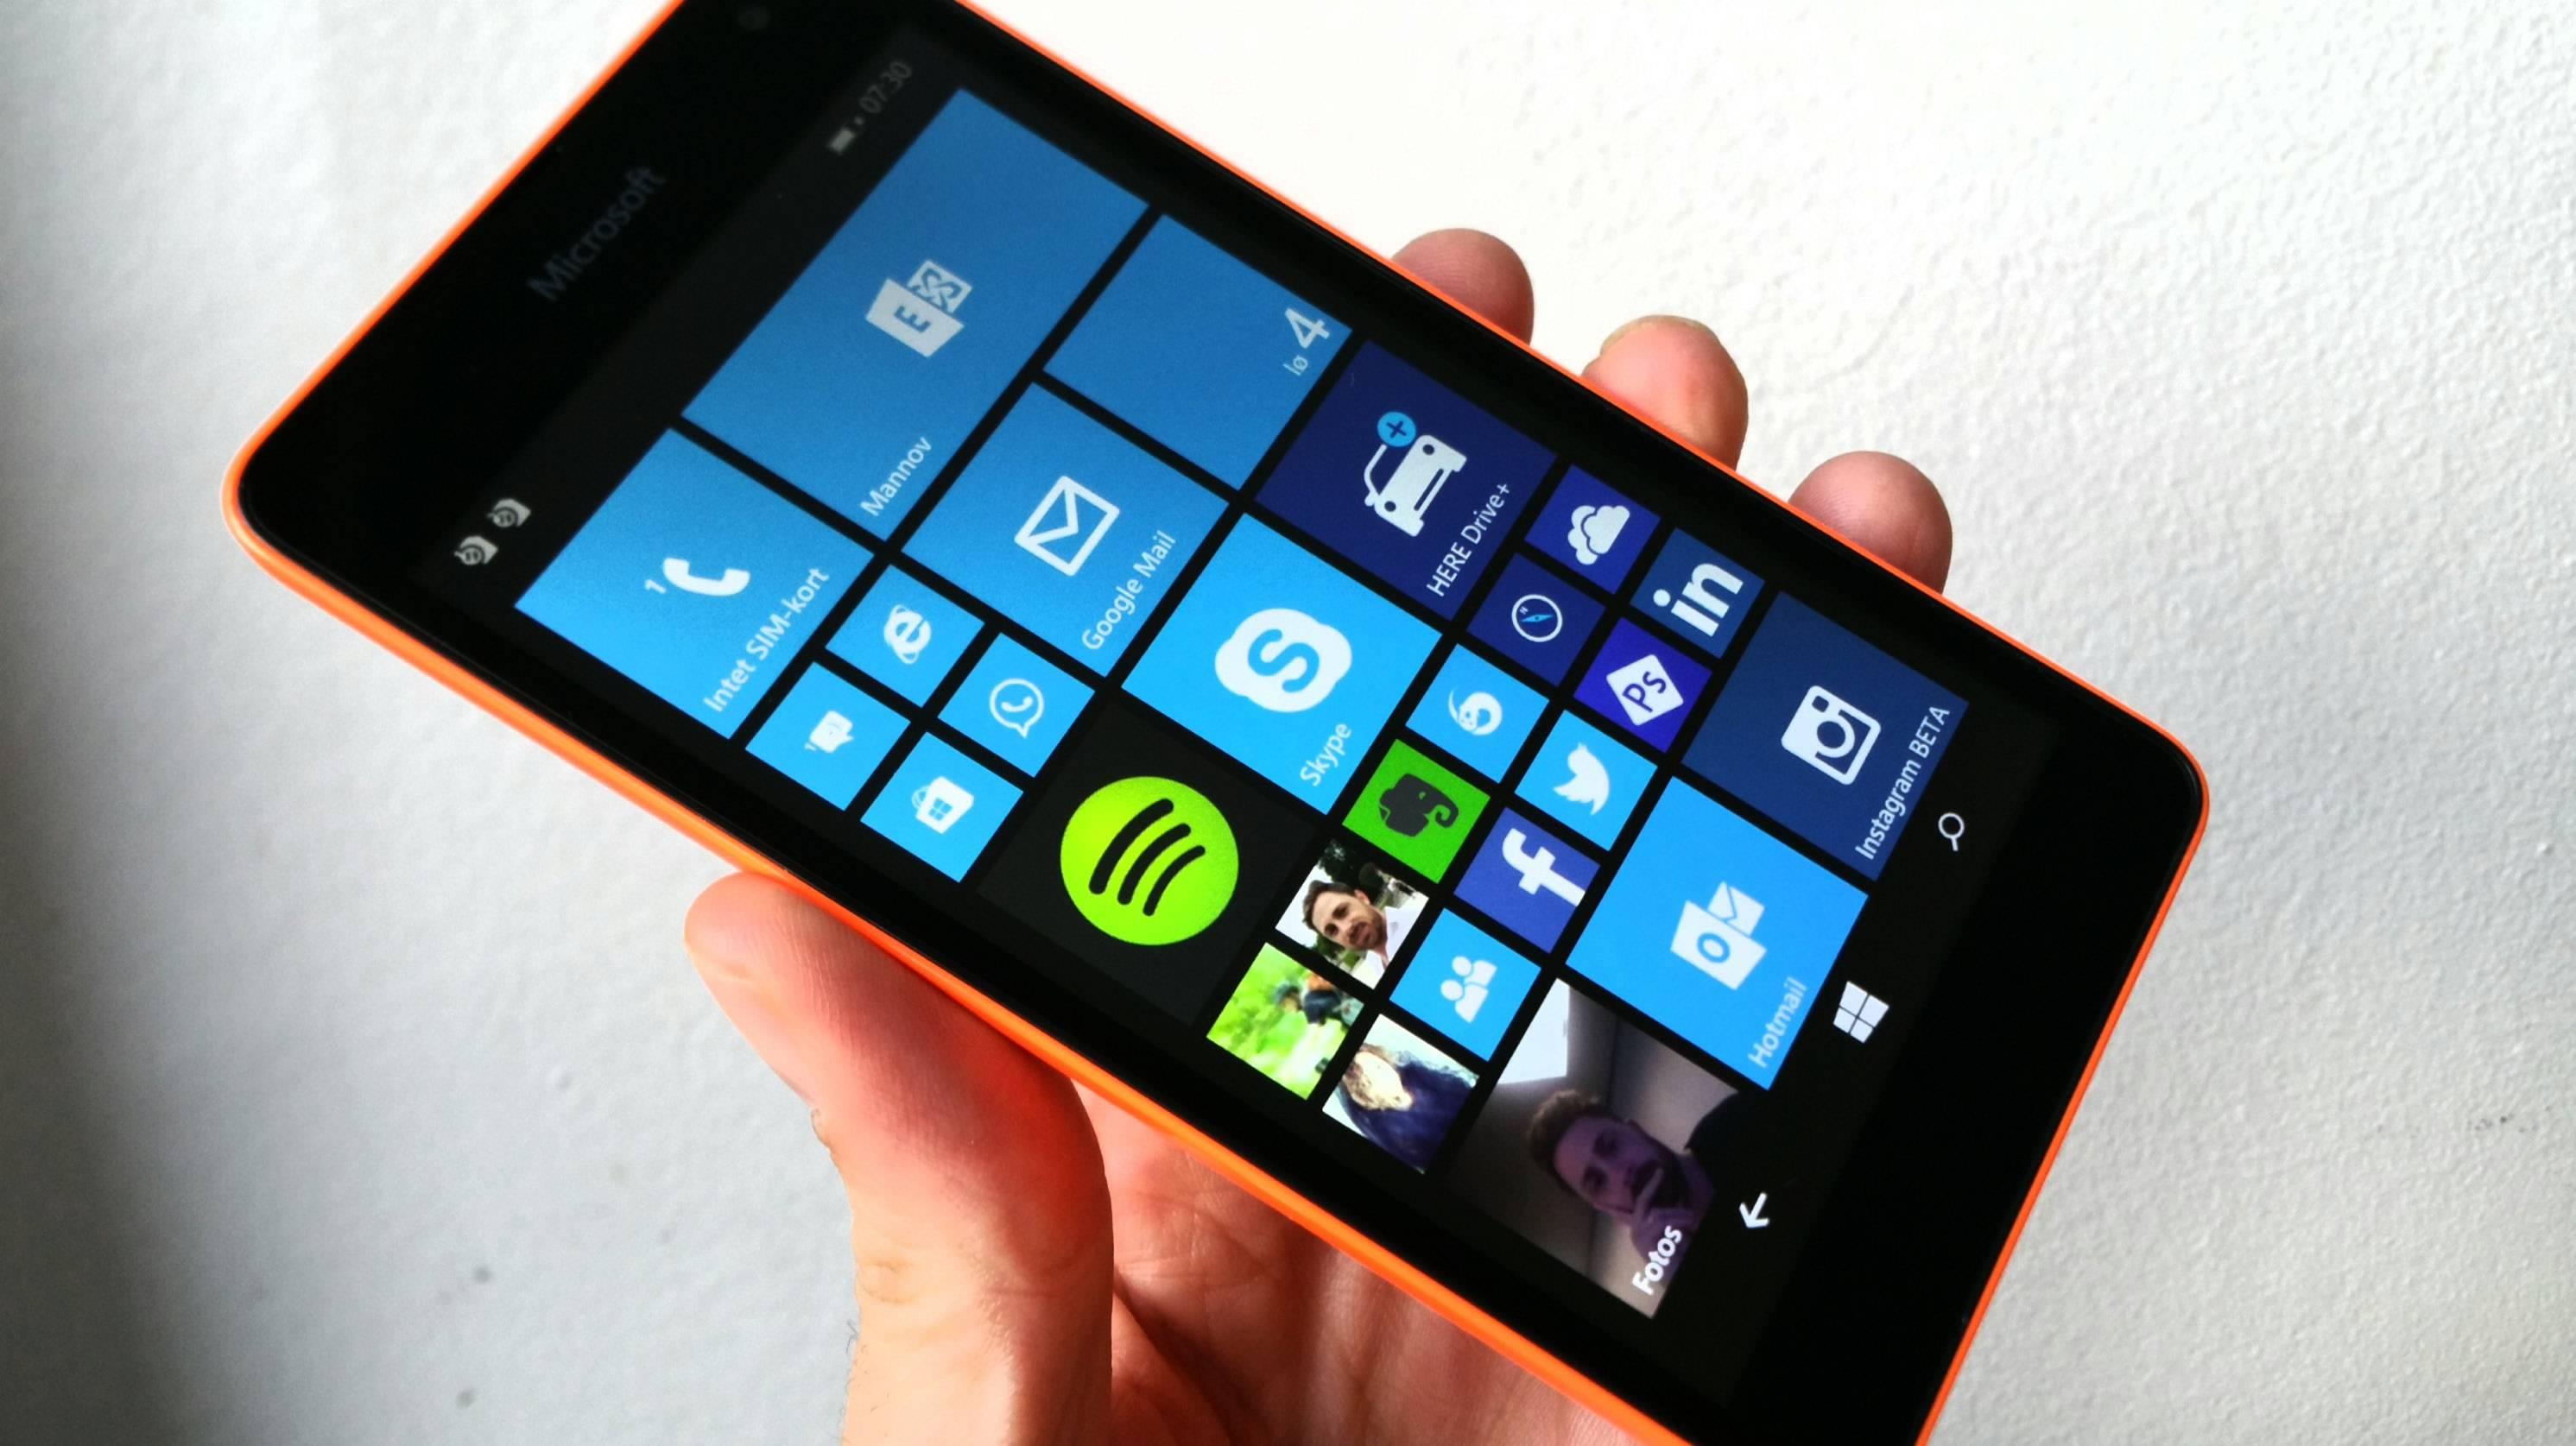 Обновляем lumia 640 до windows 10 mobile через otc updater